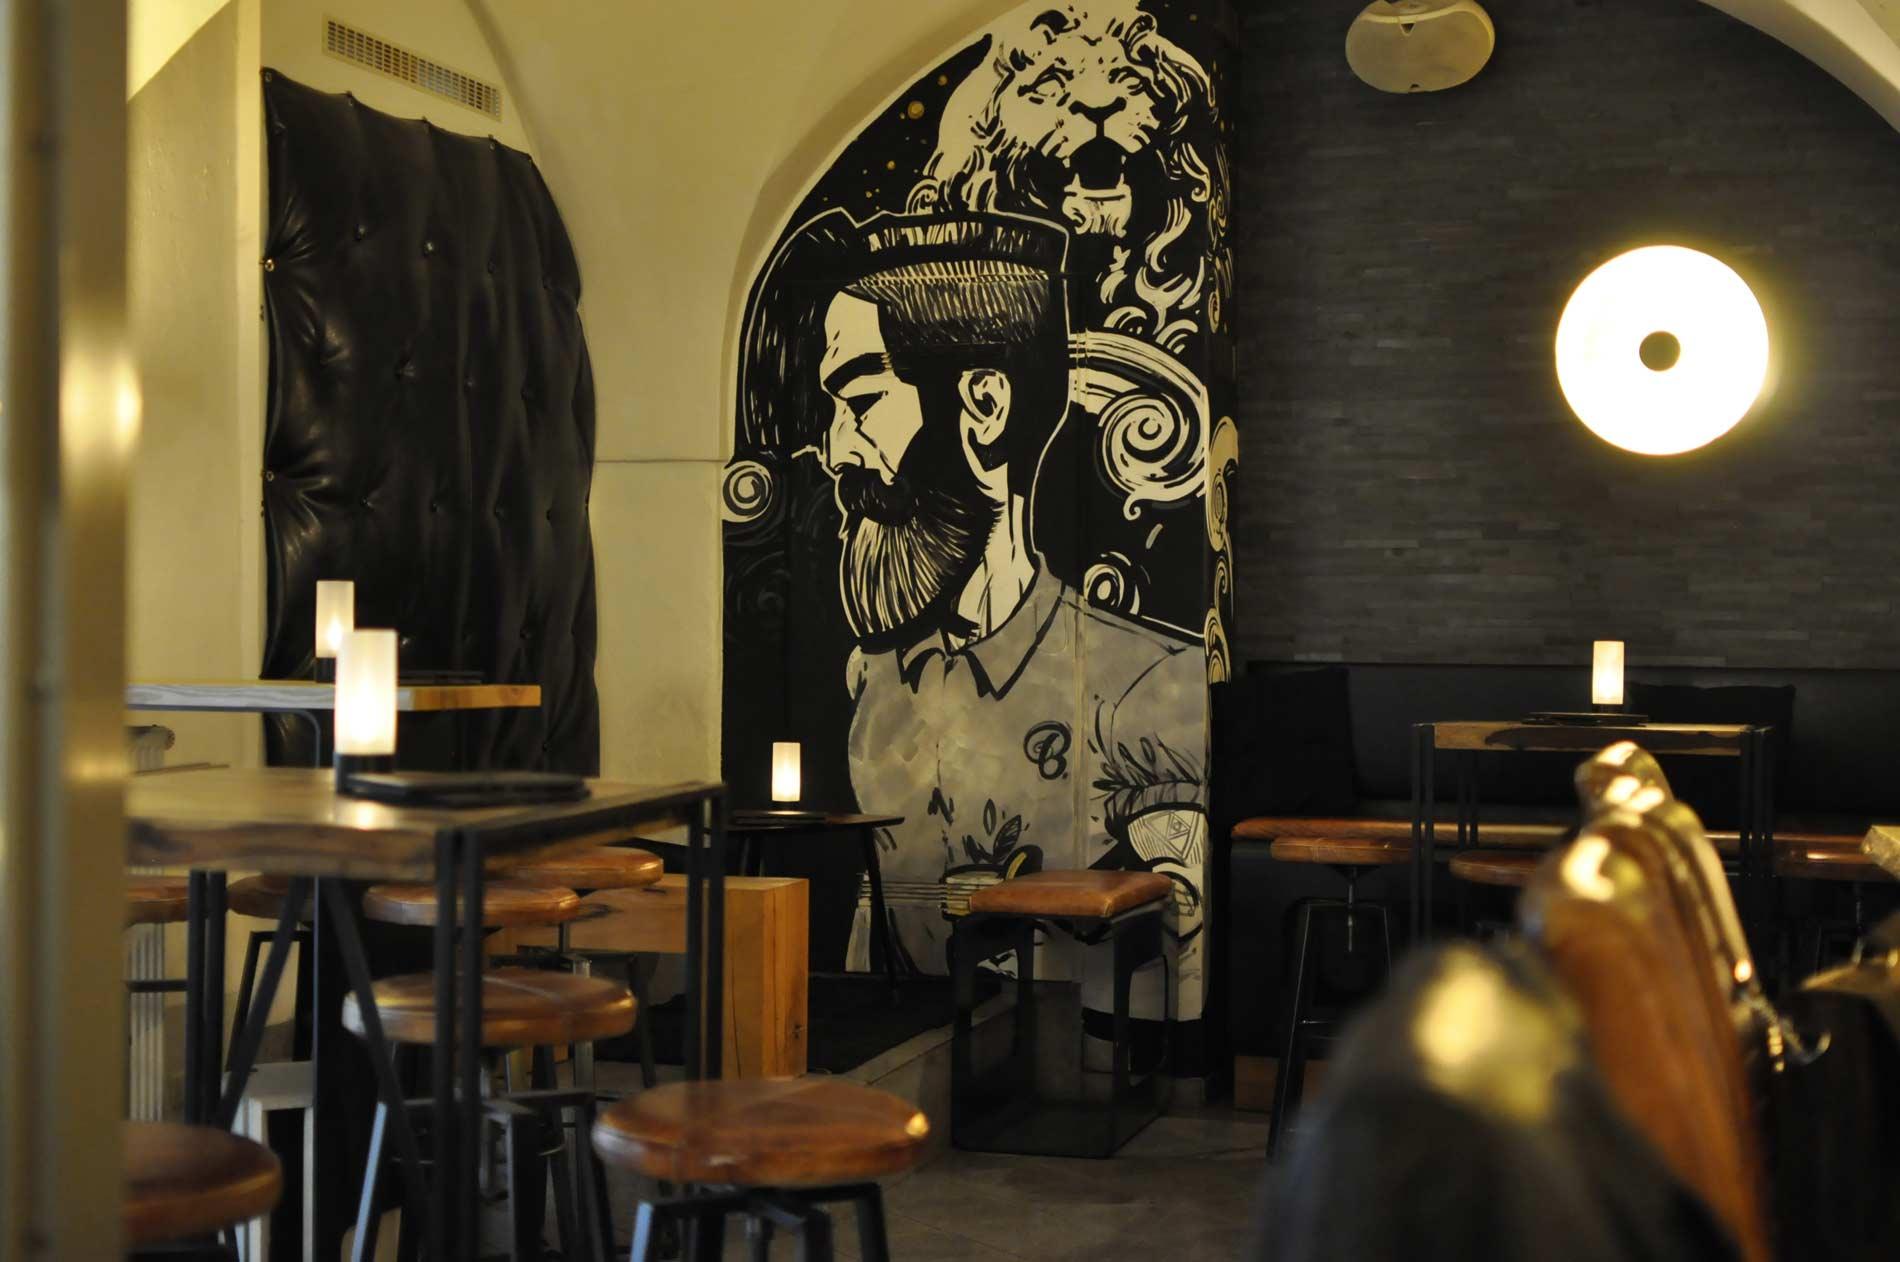 Barock Regensburg | Mixology Bar Guide